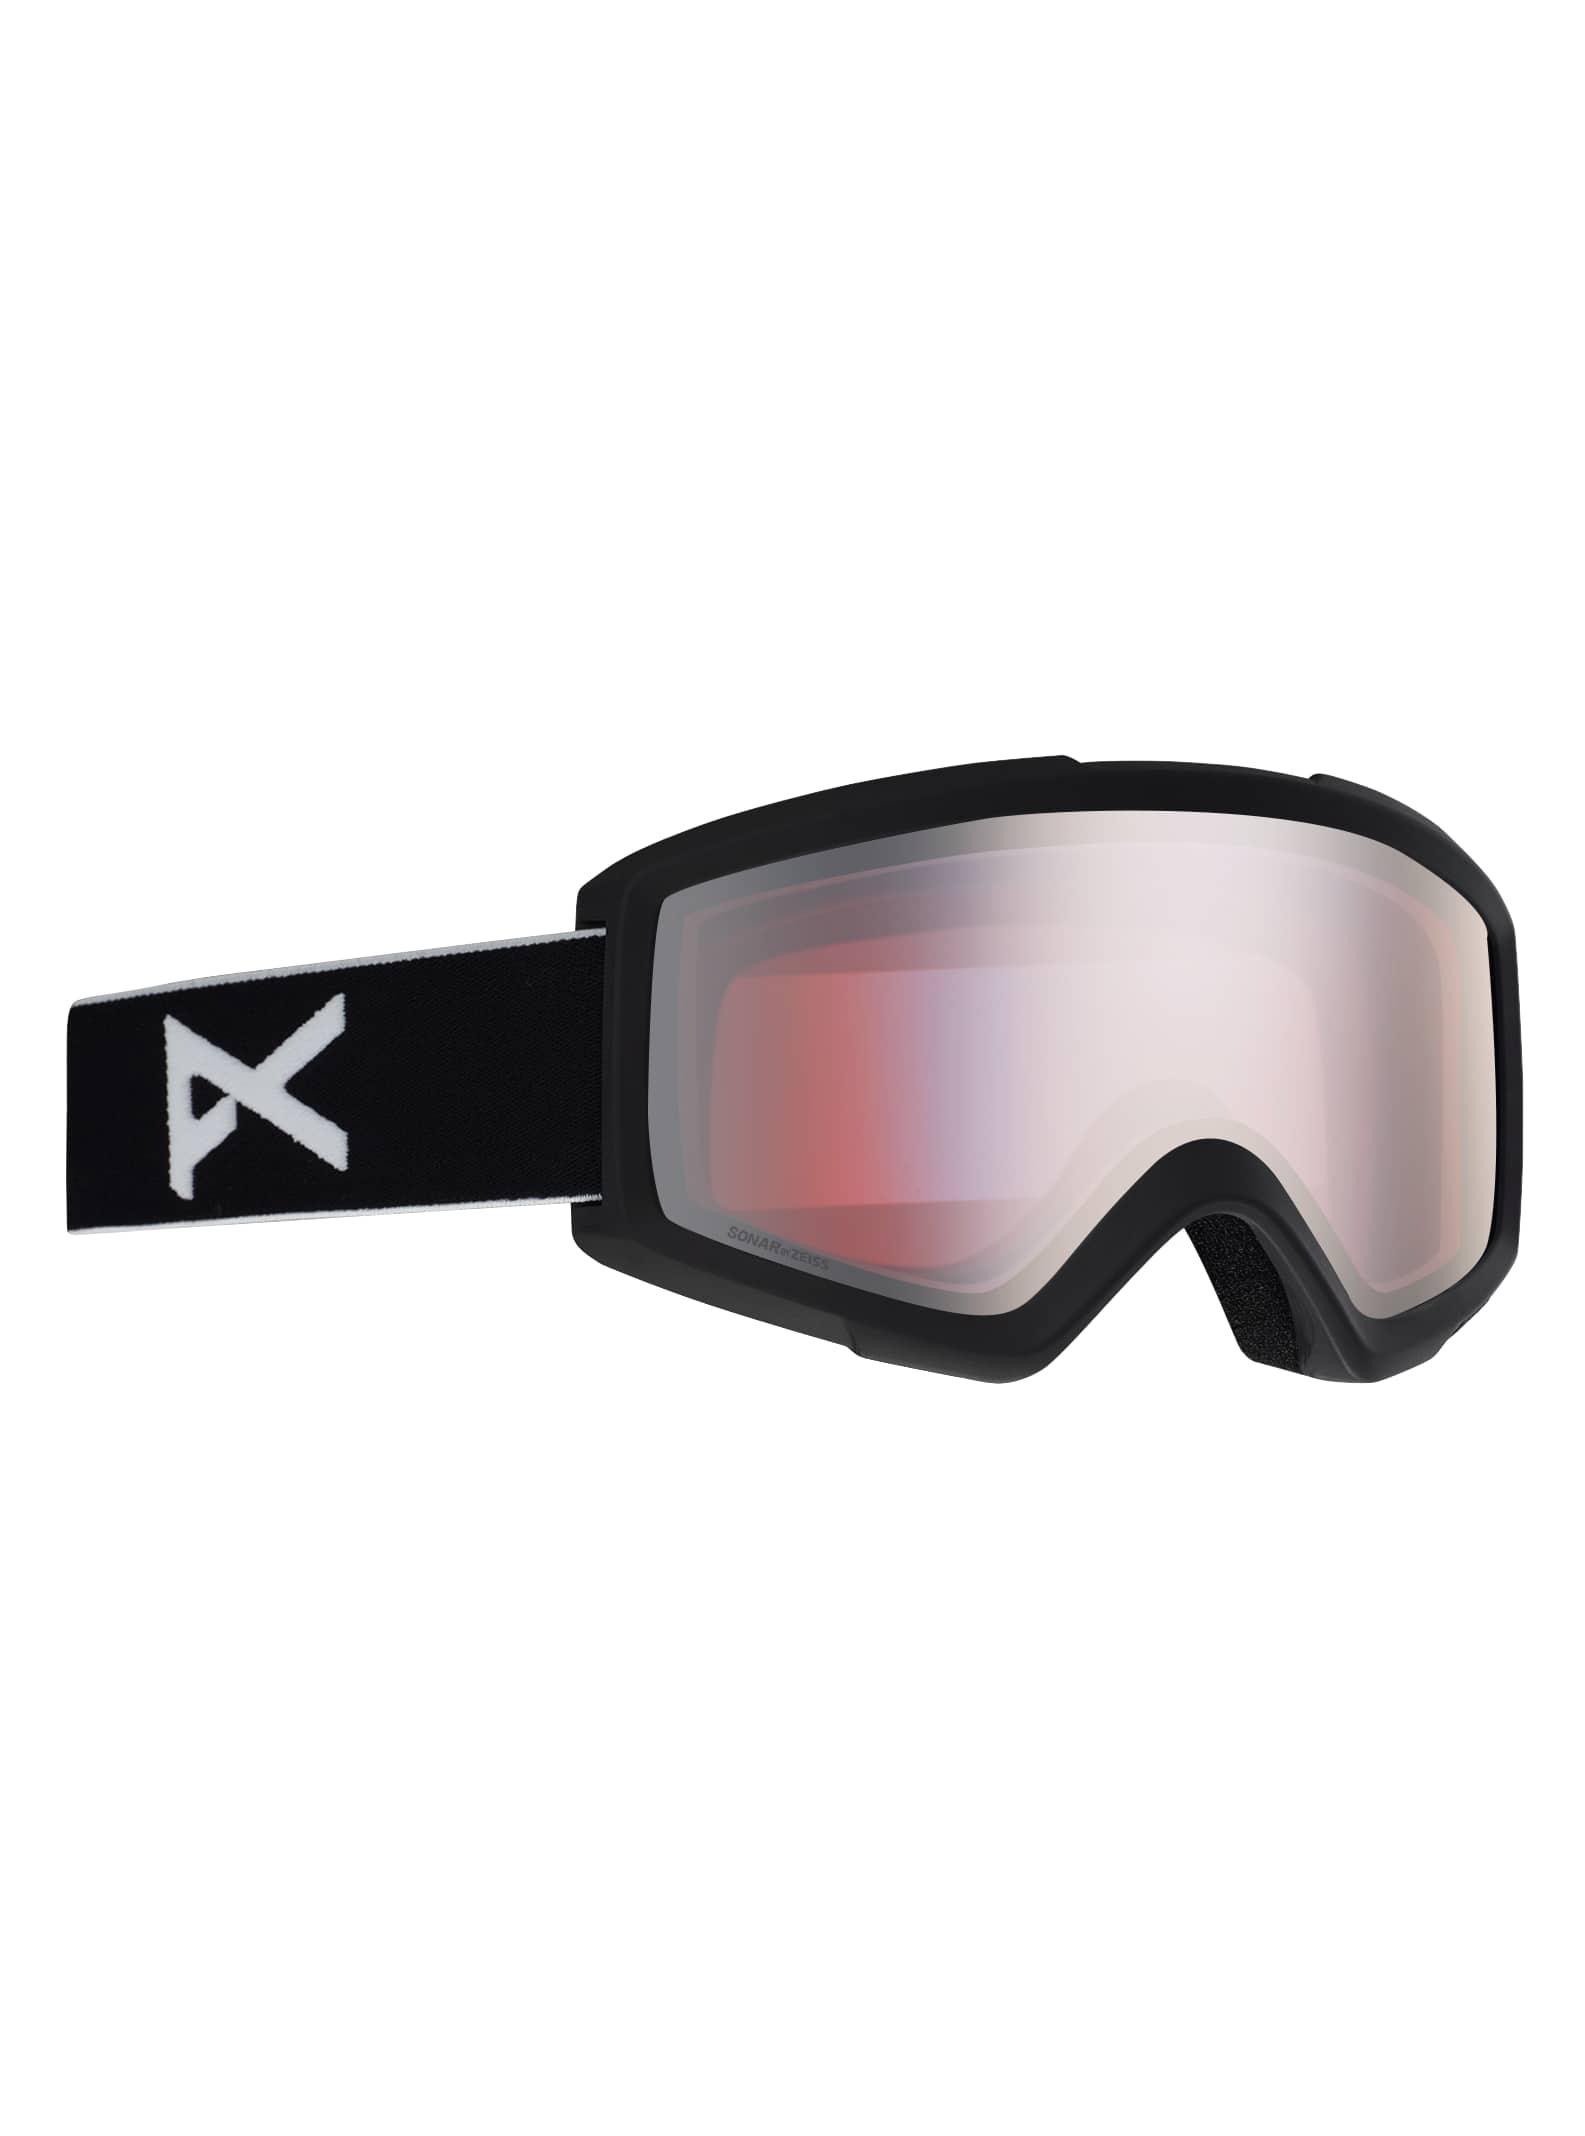 Anon Men's Helix 2.0 Sonar Goggle + Spare Lens, Frame: Black, Lens: SONAR Silver, Spare Lens: Amber